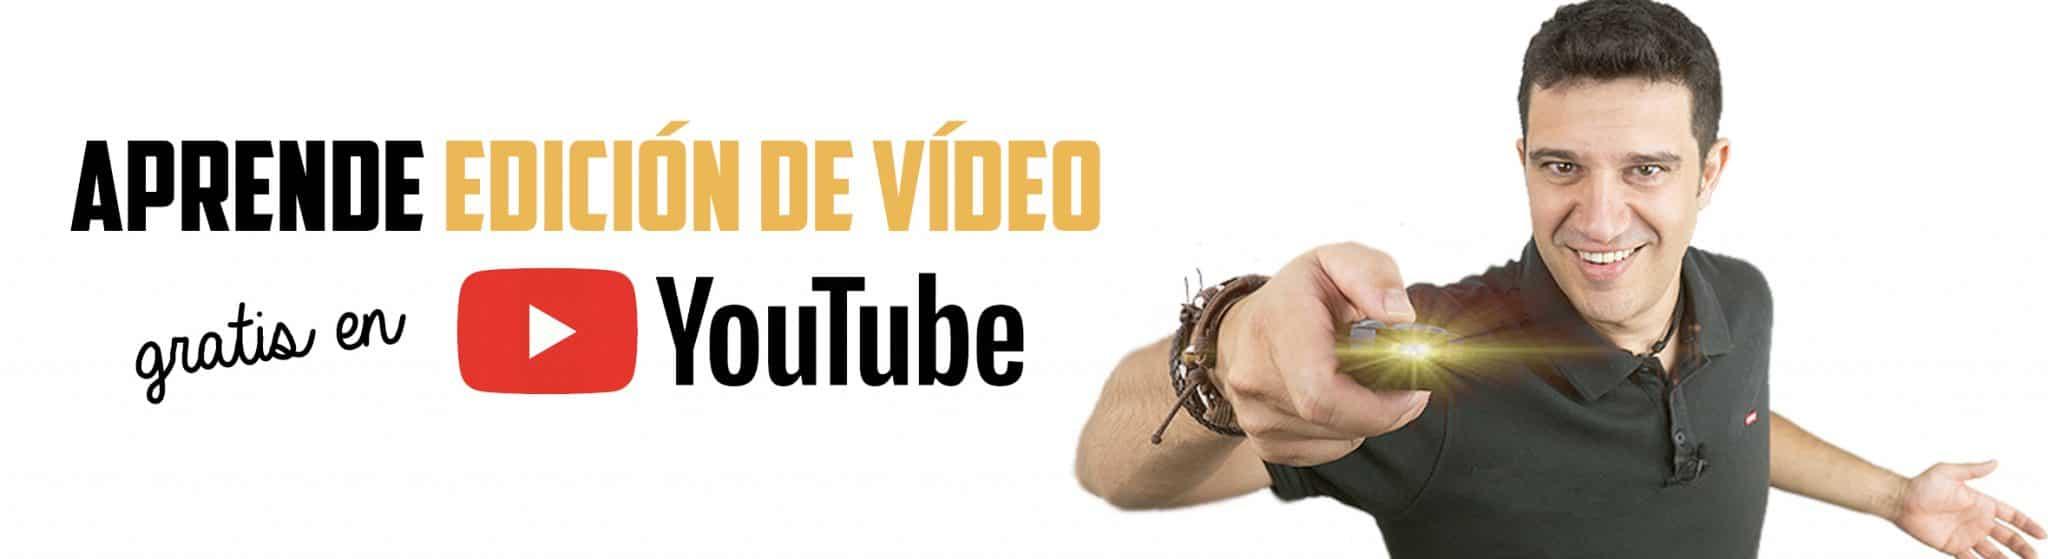 youTube-editalo pro